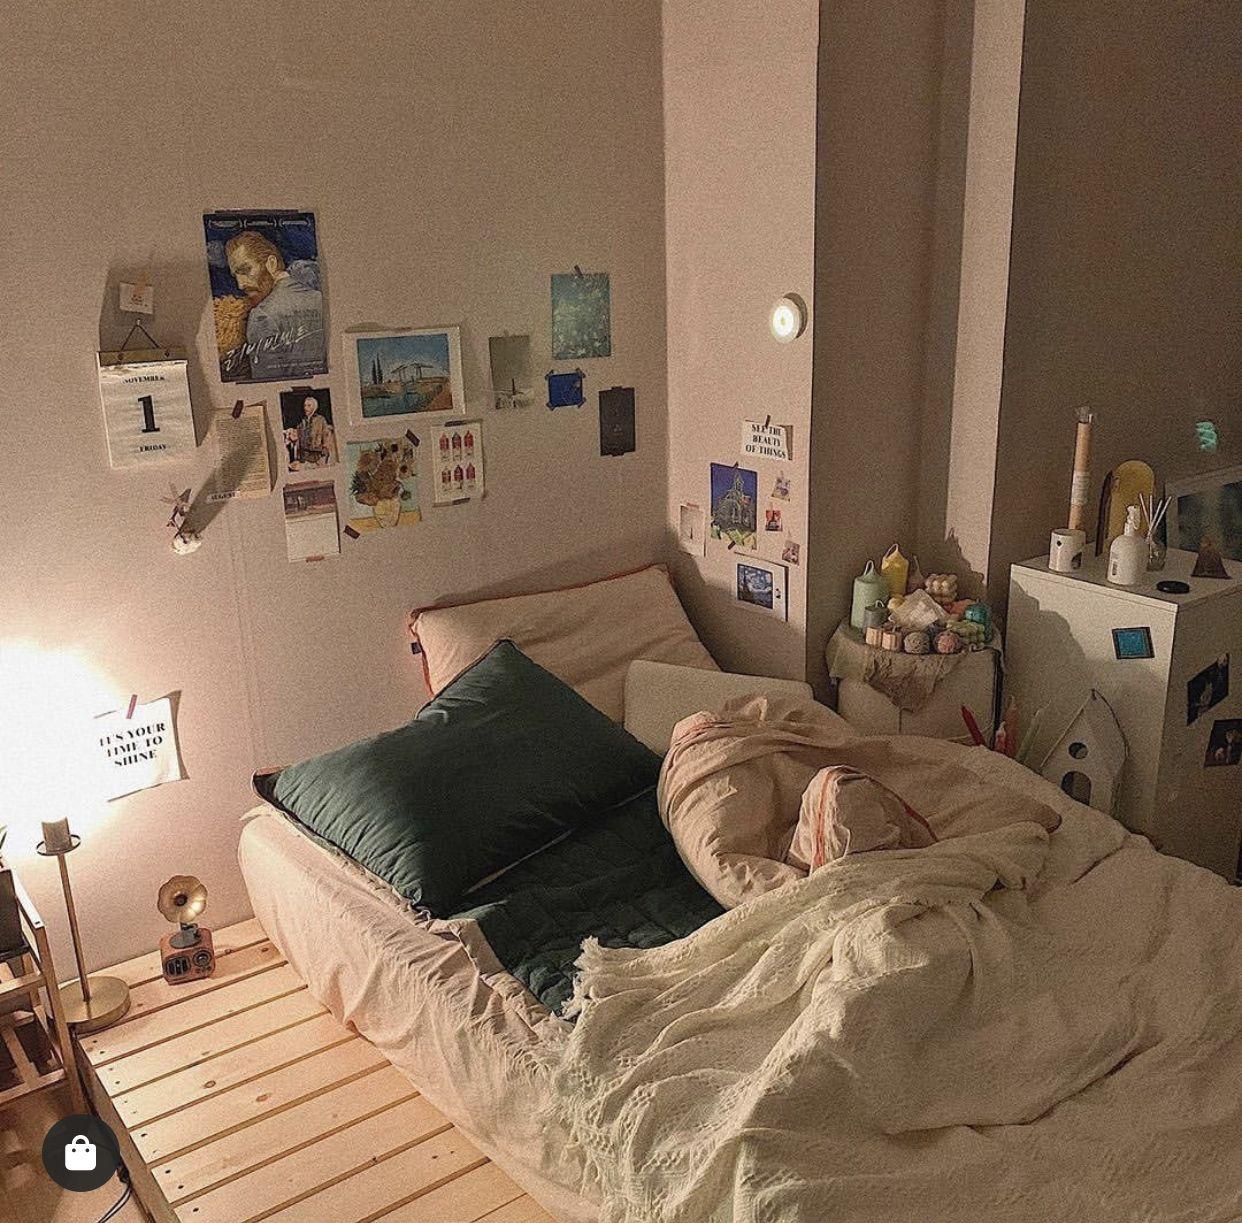 Pin Oleh Fannyadella Design Di Home Ide Dekorasi Kamar Ide Dekorasi Rumah Ide Dekorasi Kamar Tidur Korean-style minimalist bedroom decoration